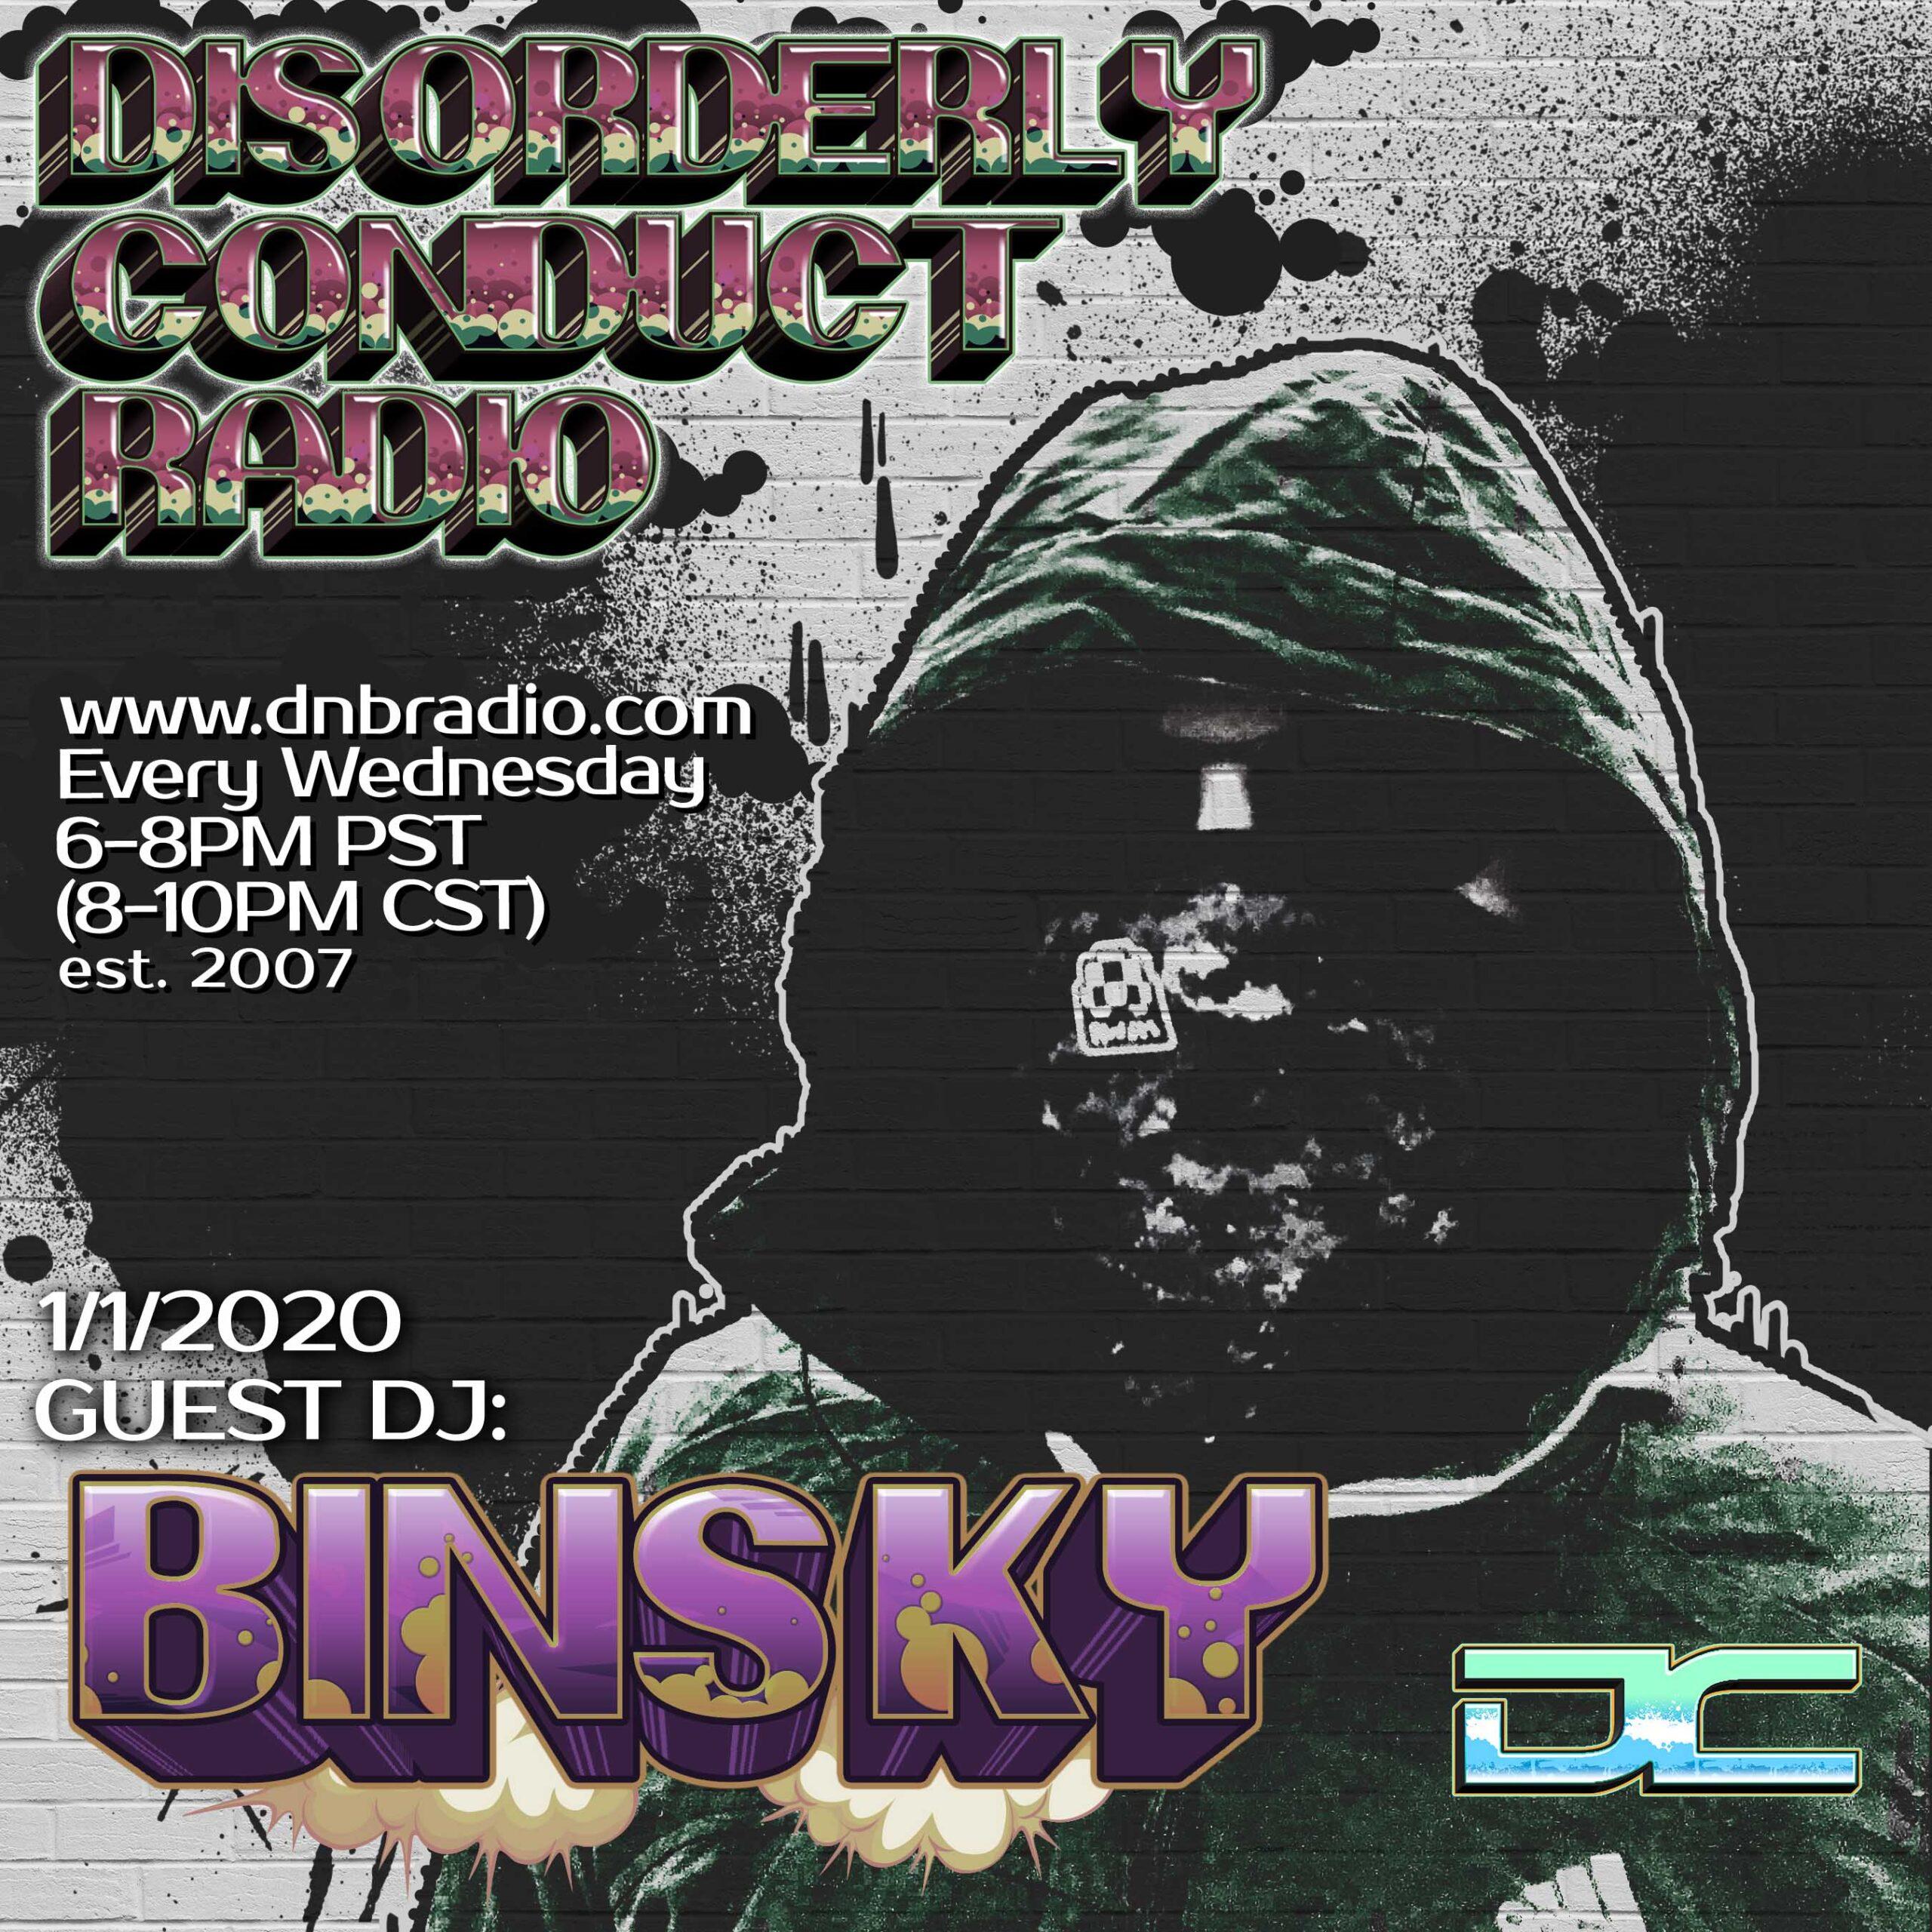 Mr. Solve and Binsky – Disorderly Conduct Radio 010120